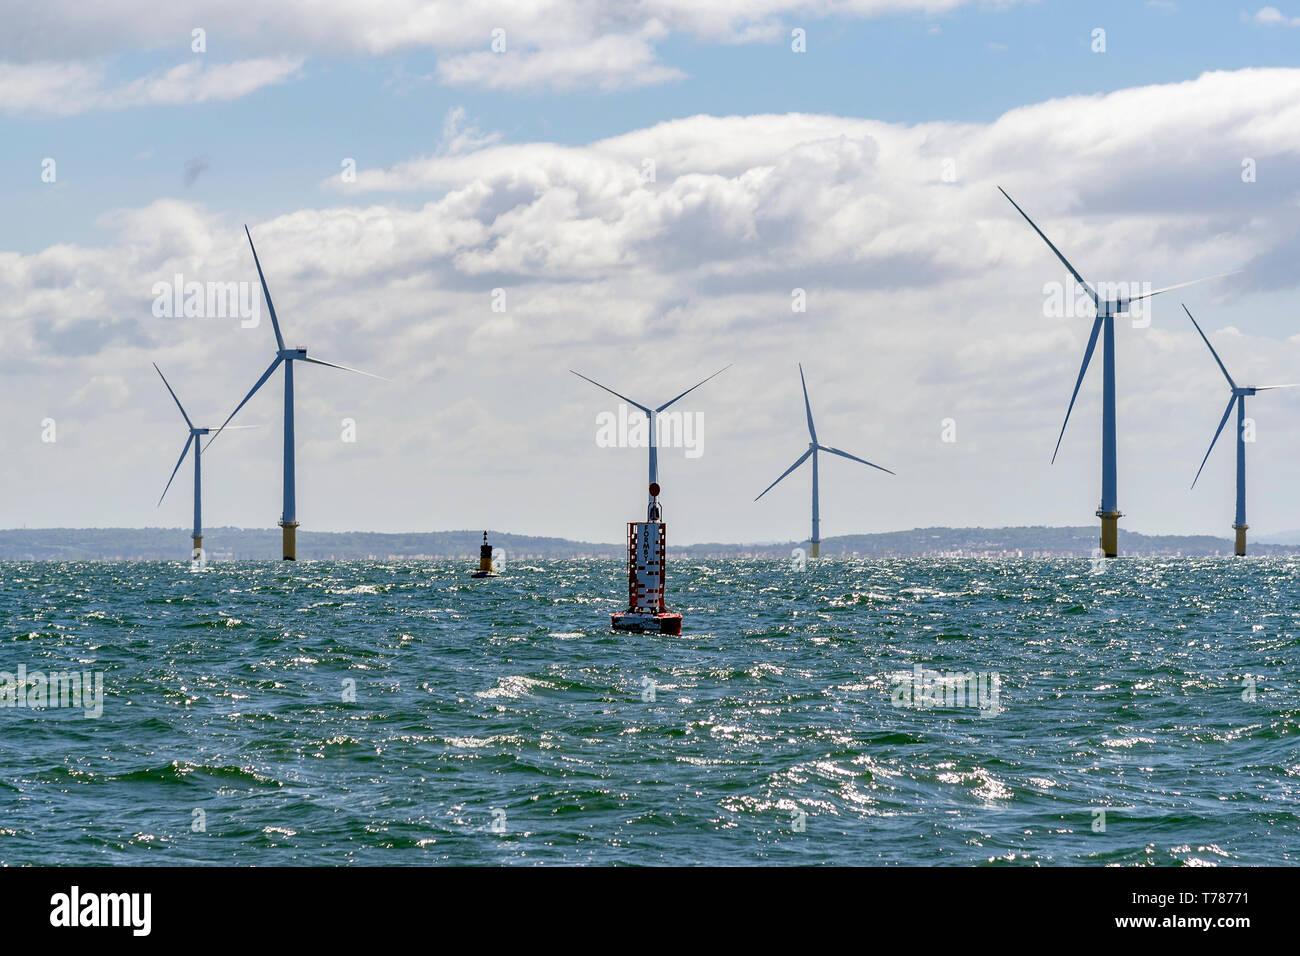 River Mersey windfarm windmills. - Stock Image